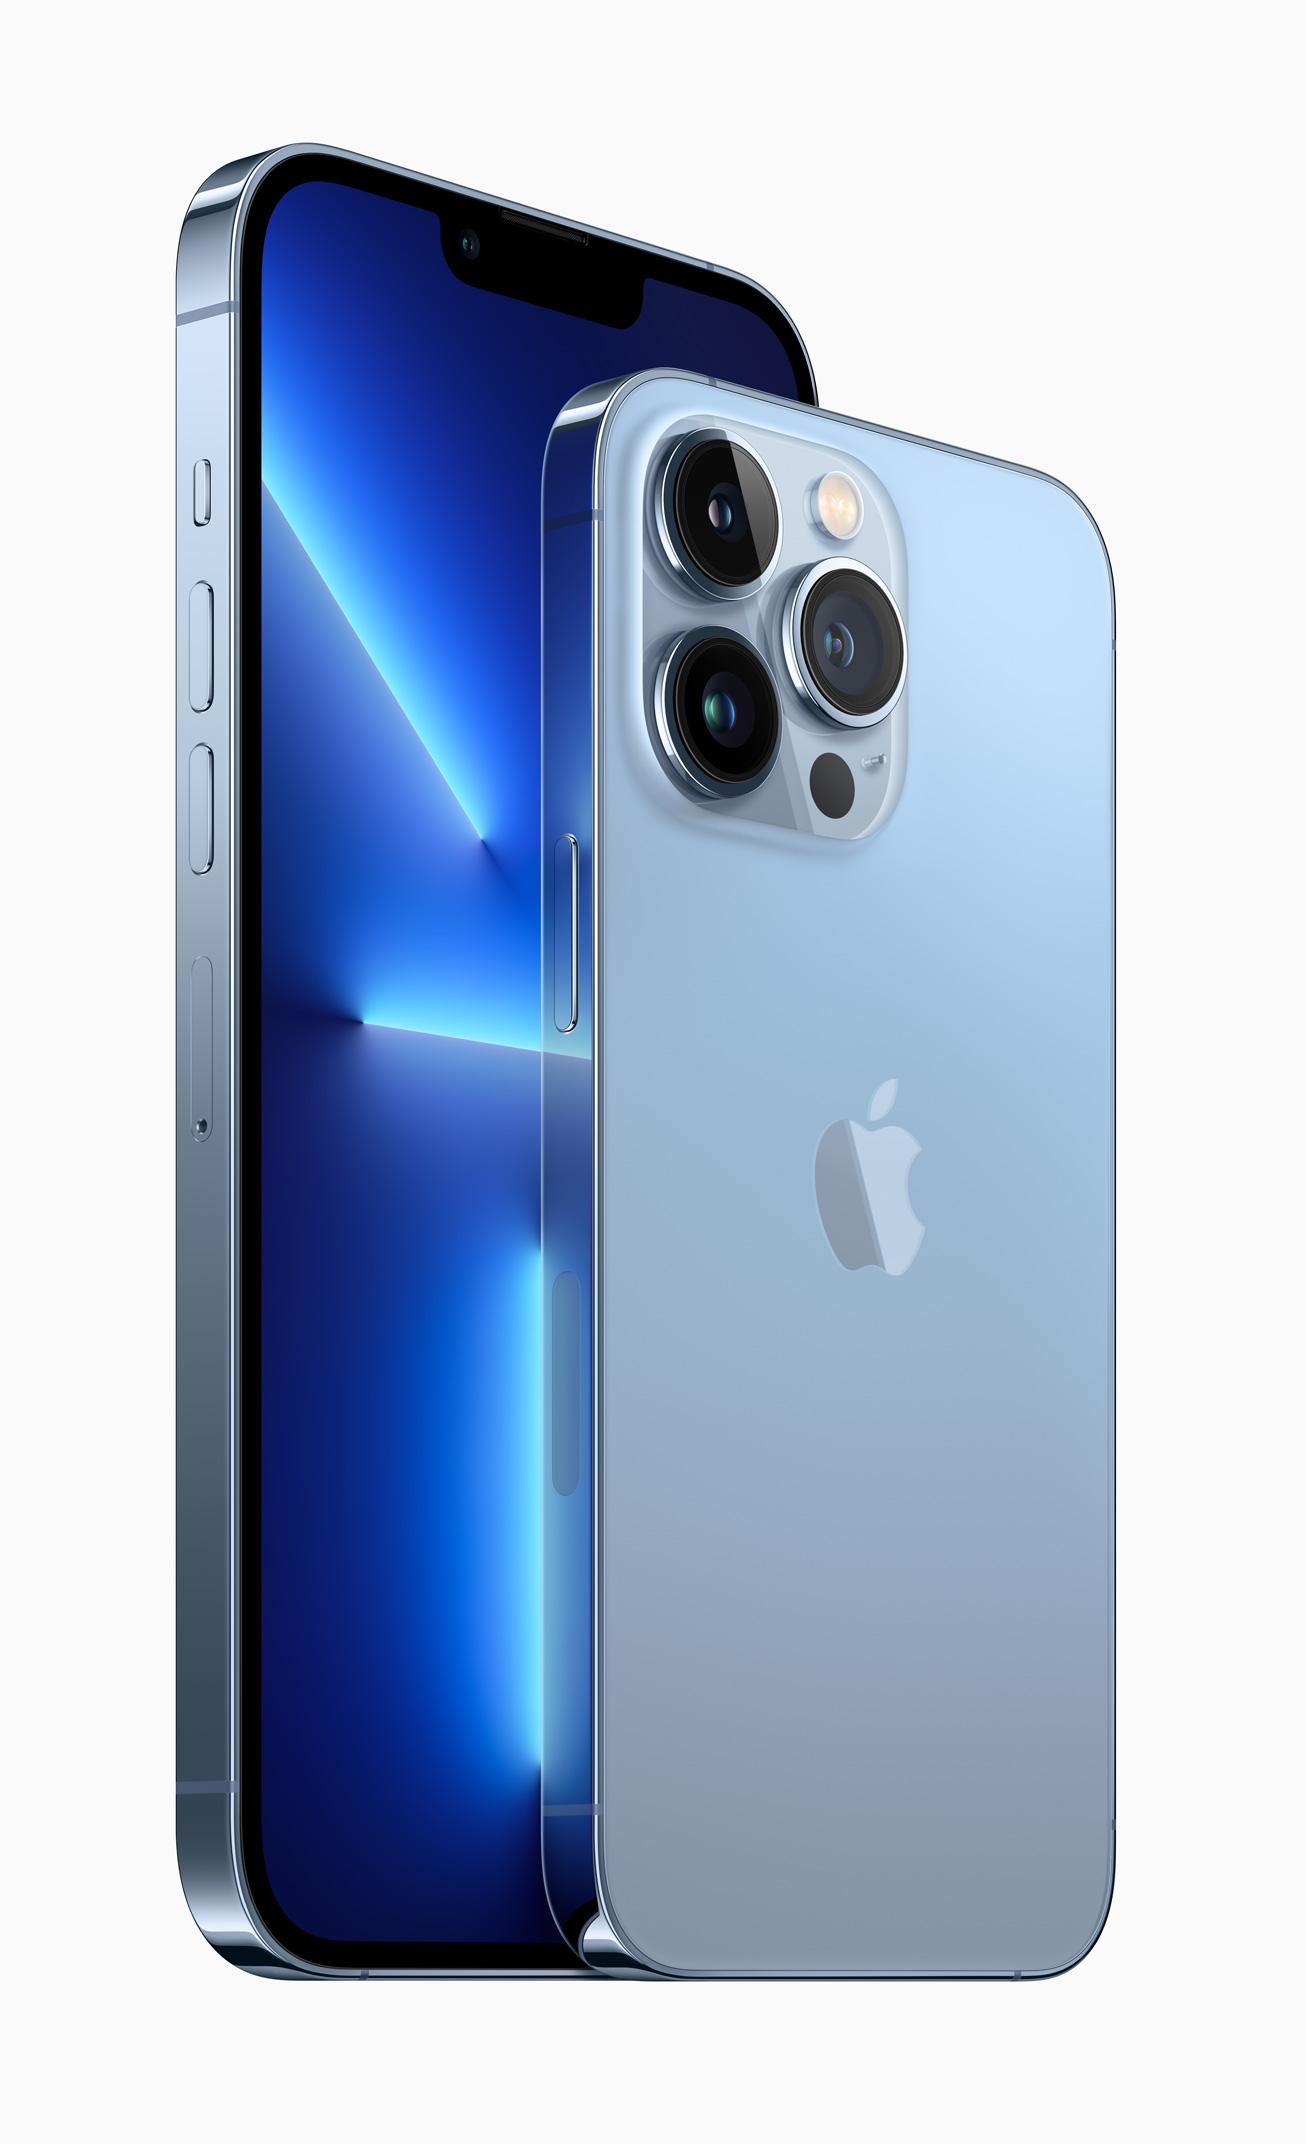 iPhone 13 Pro: Εμφανίζονται τα πρώτα benchmarks στο Geekbench